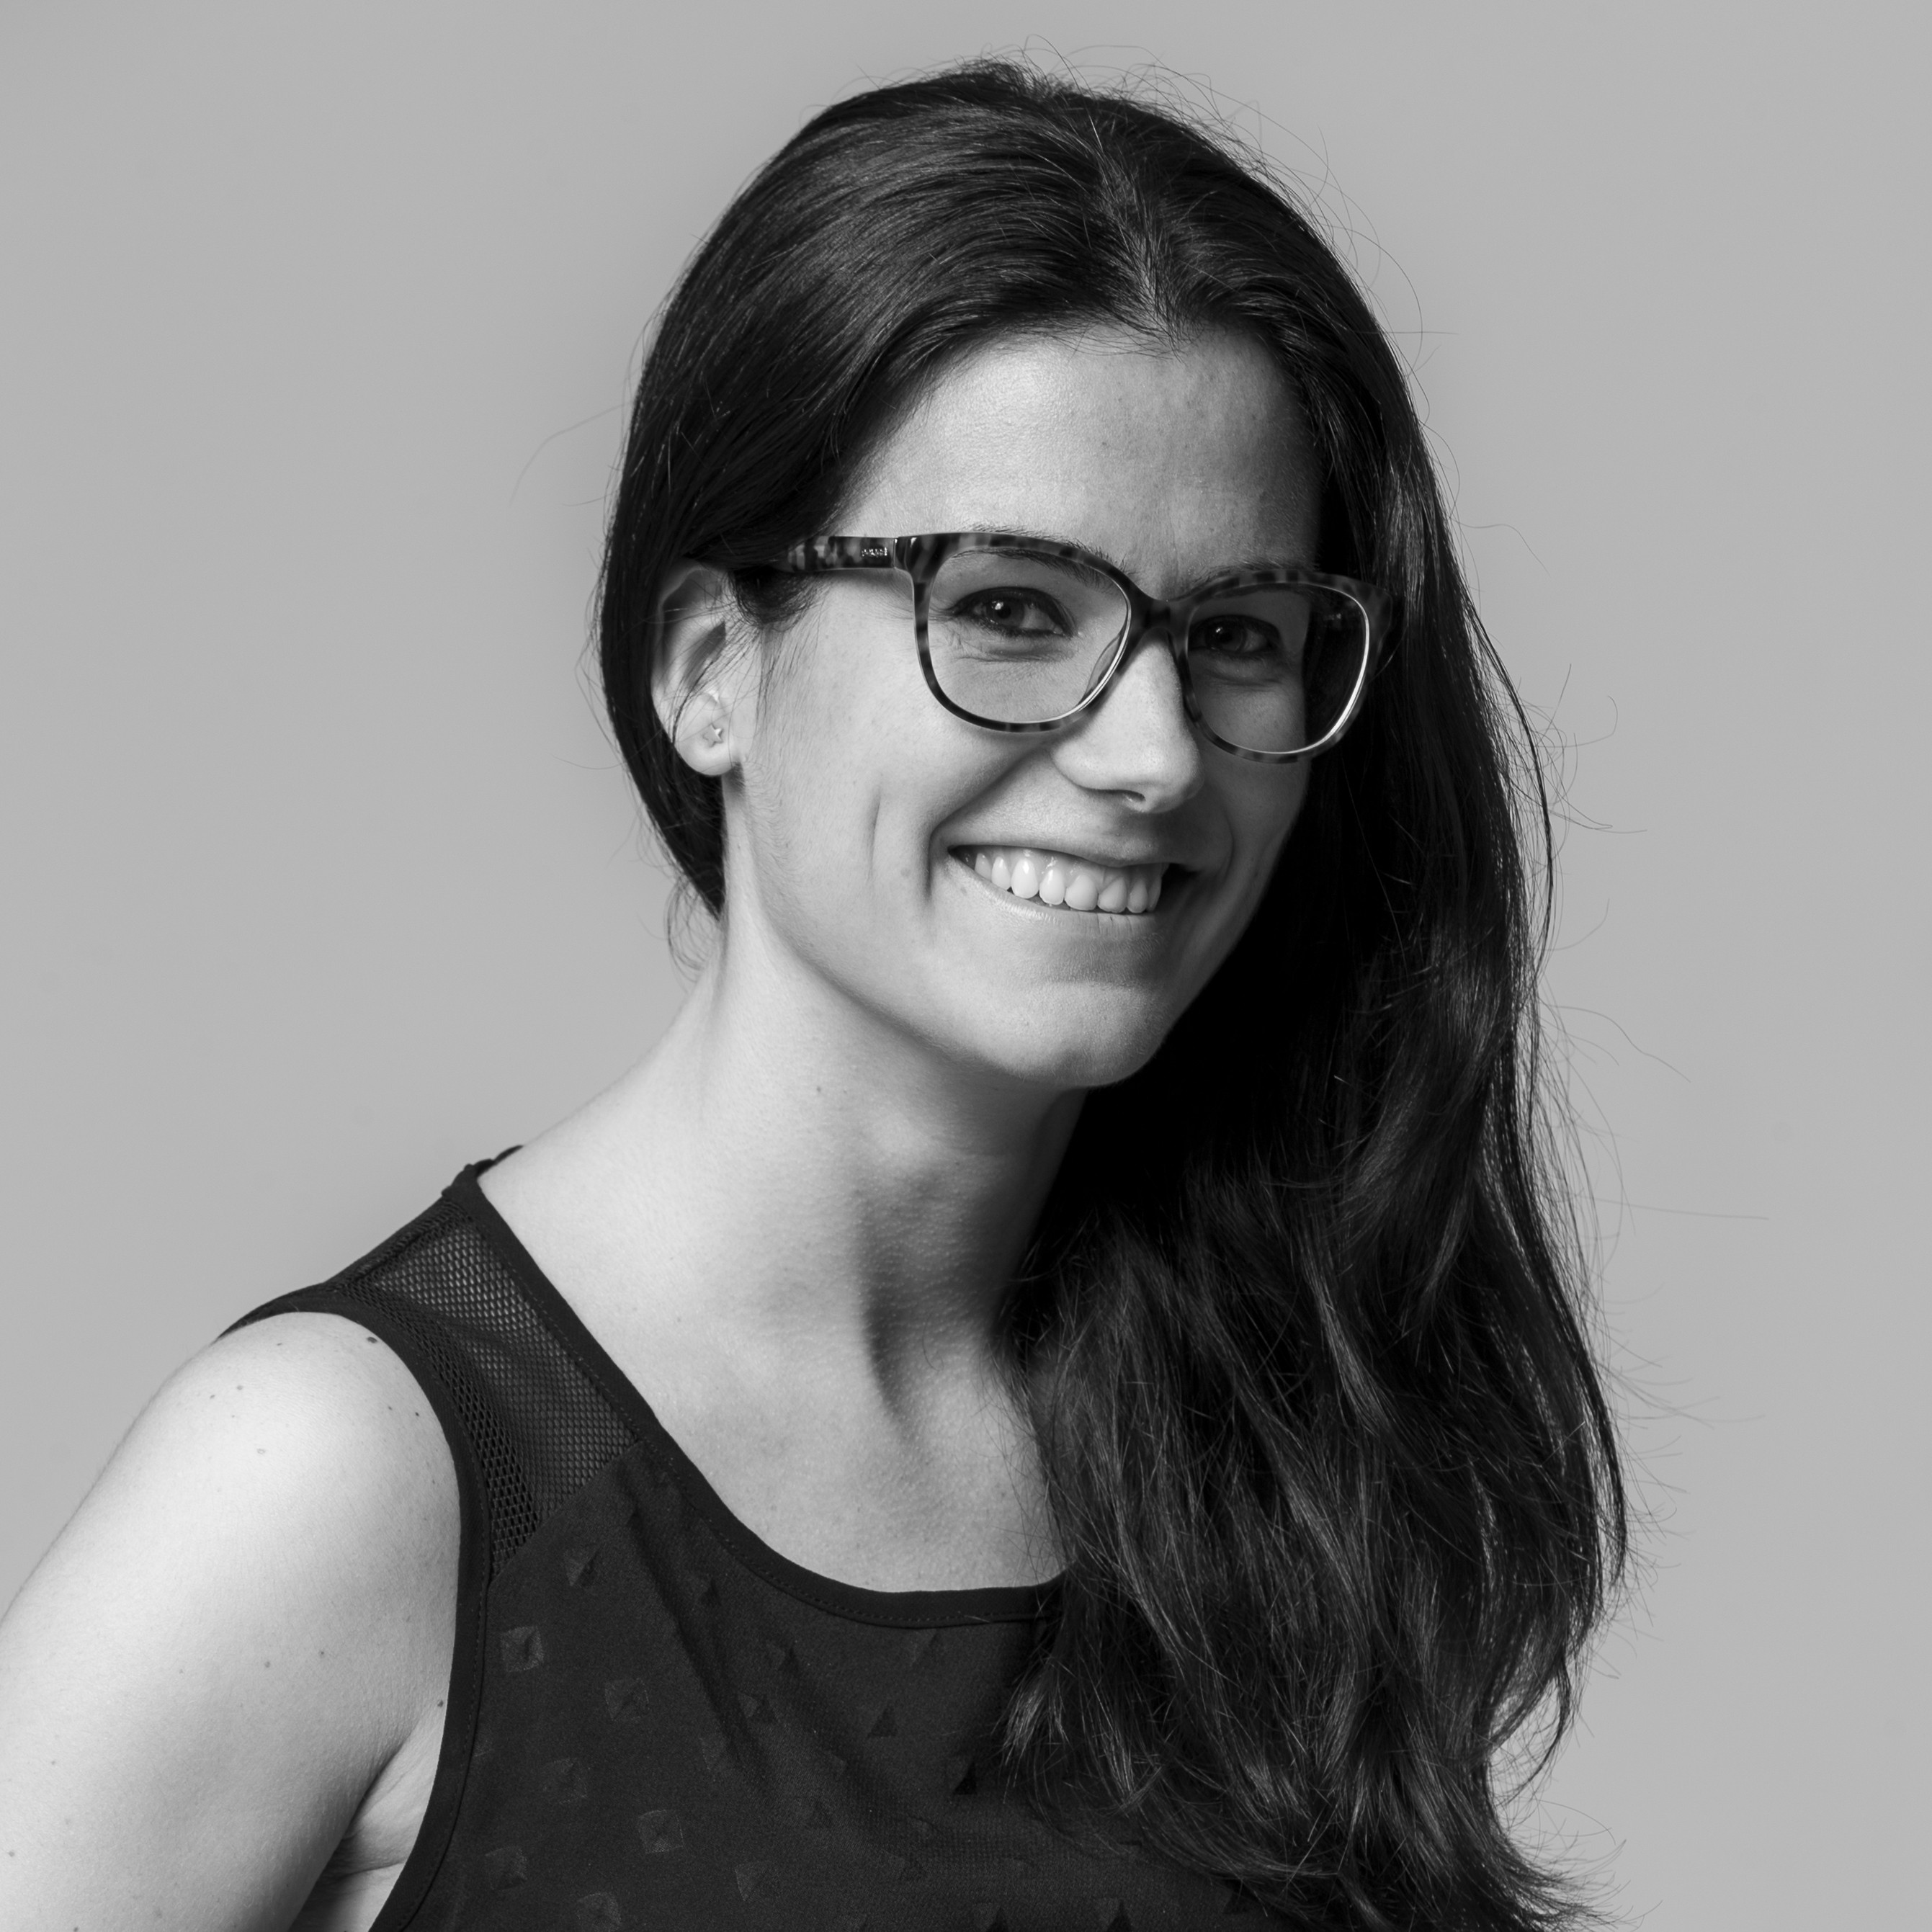 Dra. Maria Arrieta